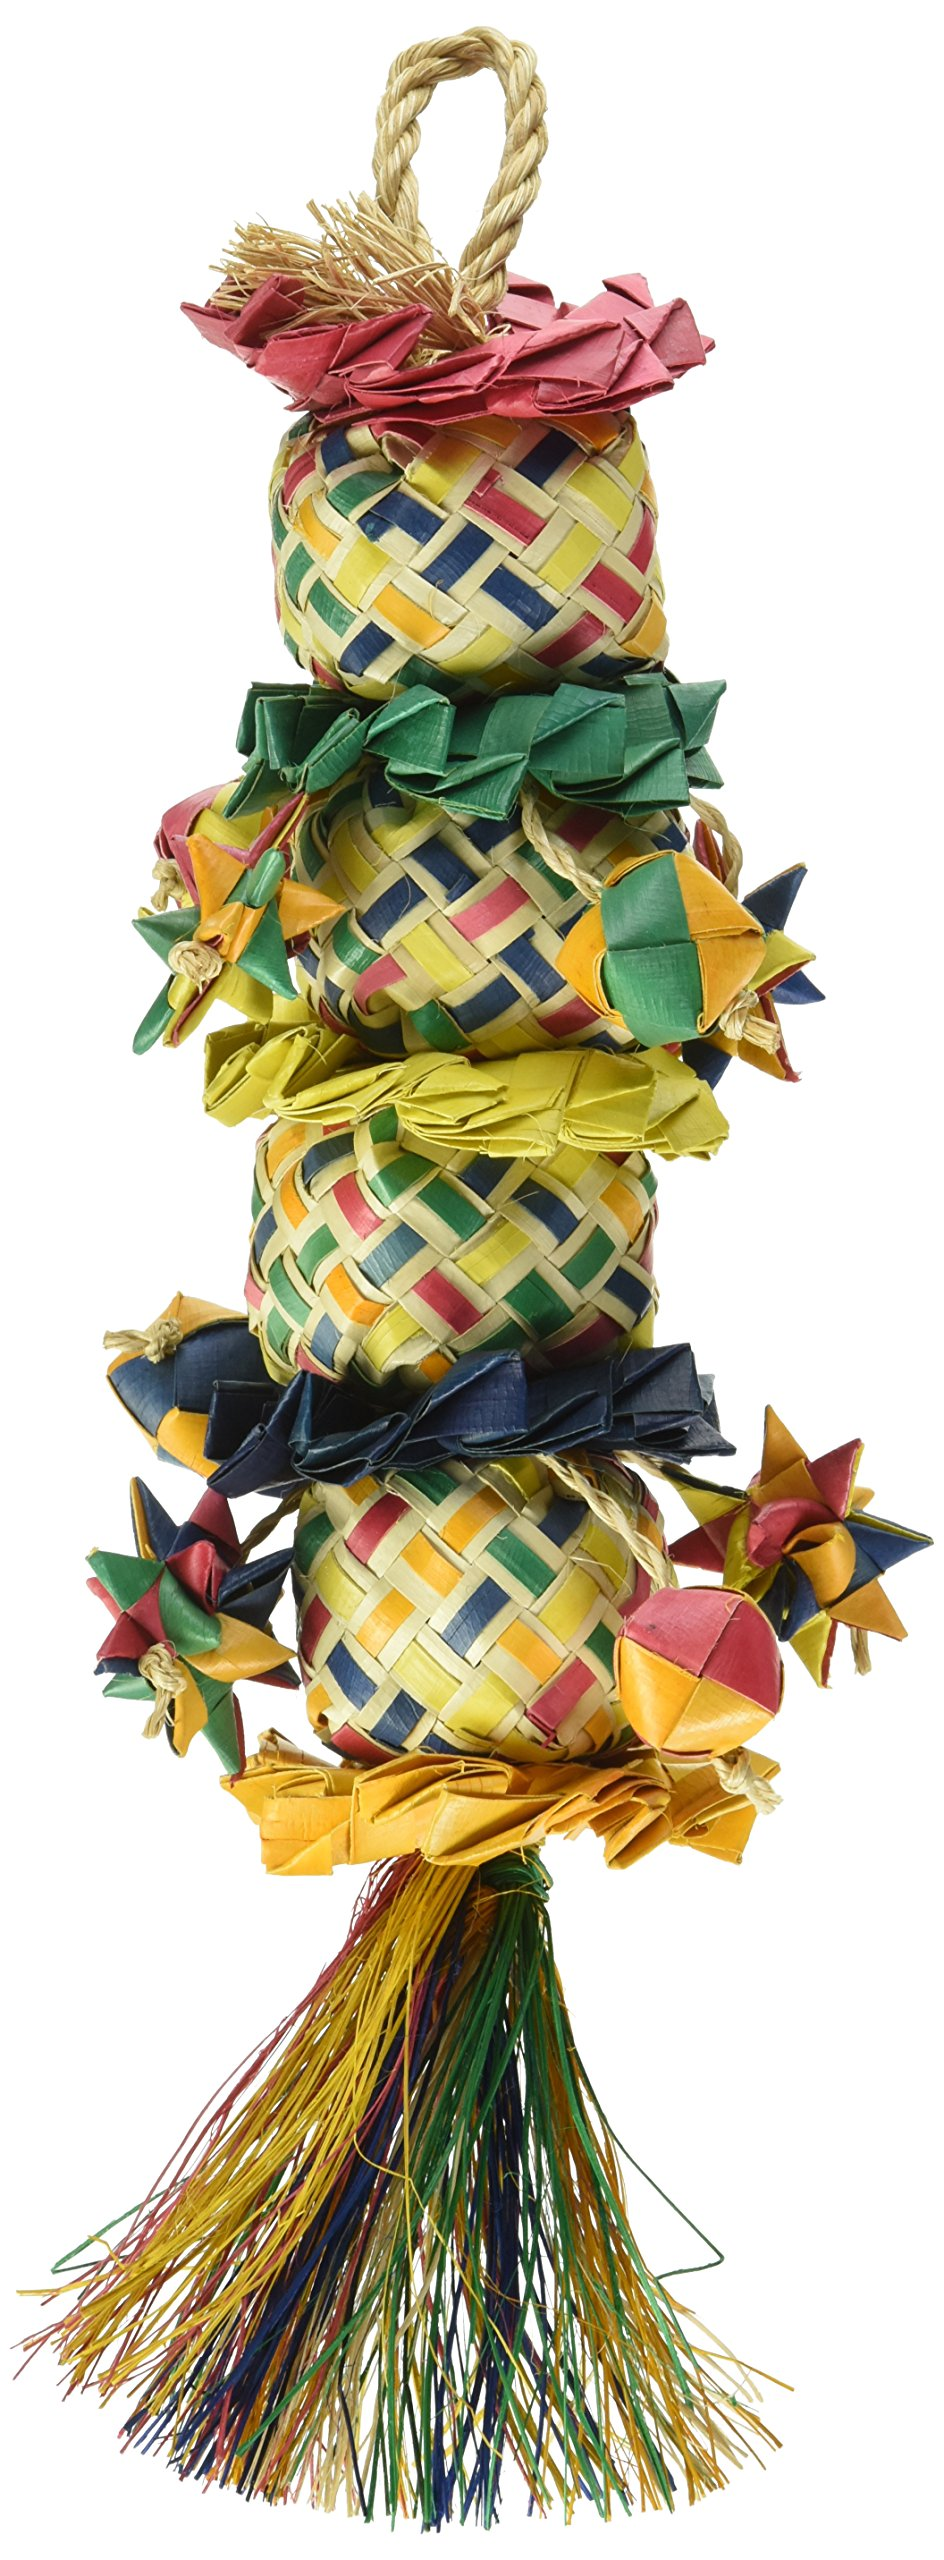 Planet Pleasures Flower Tower Bird Toy, Medium